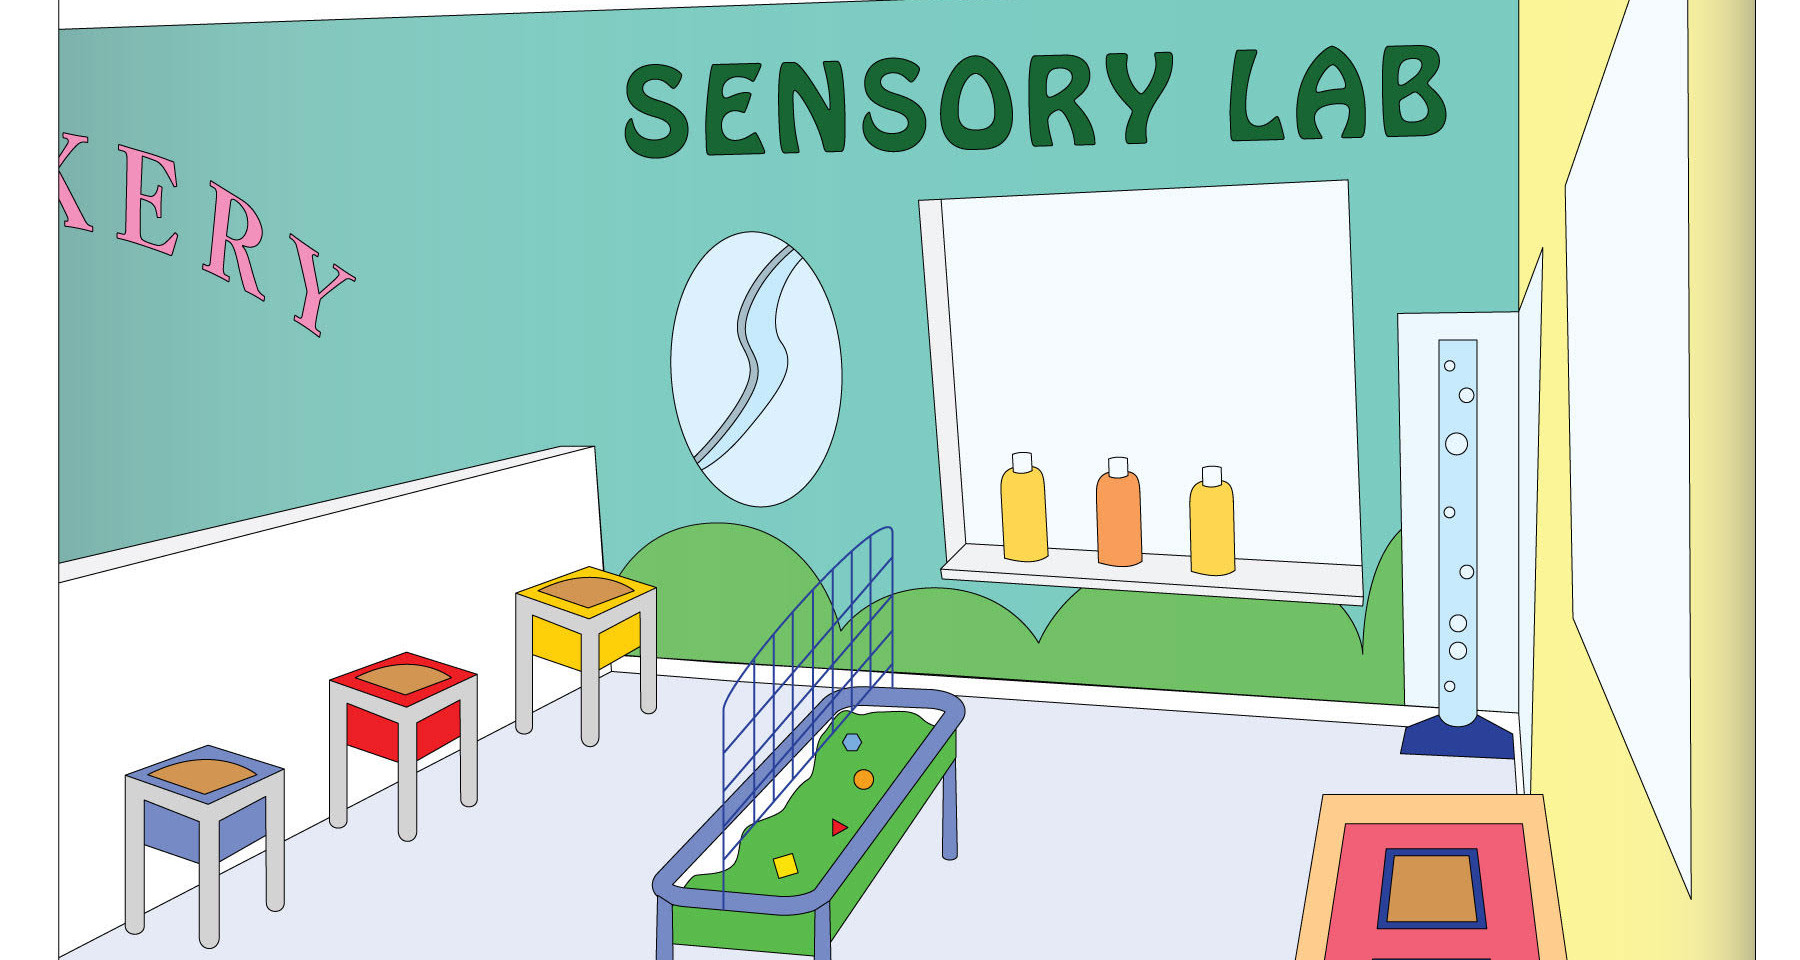 Sensory Lab Side View